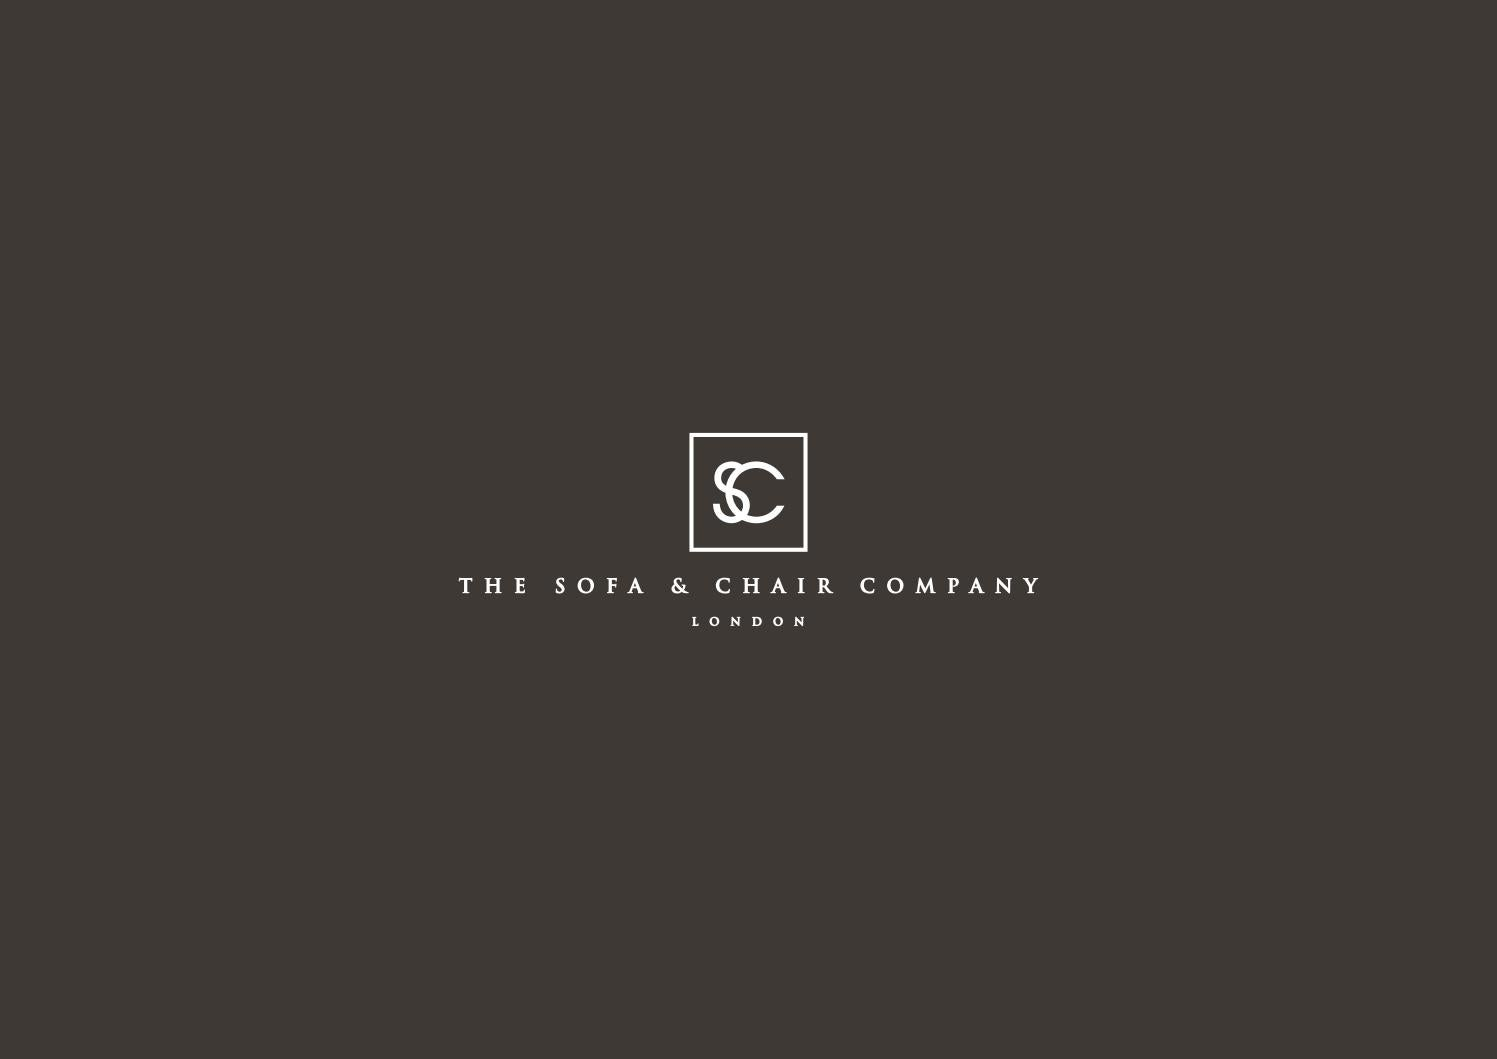 Miraculous Company Presentation By The Sofa And Chair Company Issuu Creativecarmelina Interior Chair Design Creativecarmelinacom